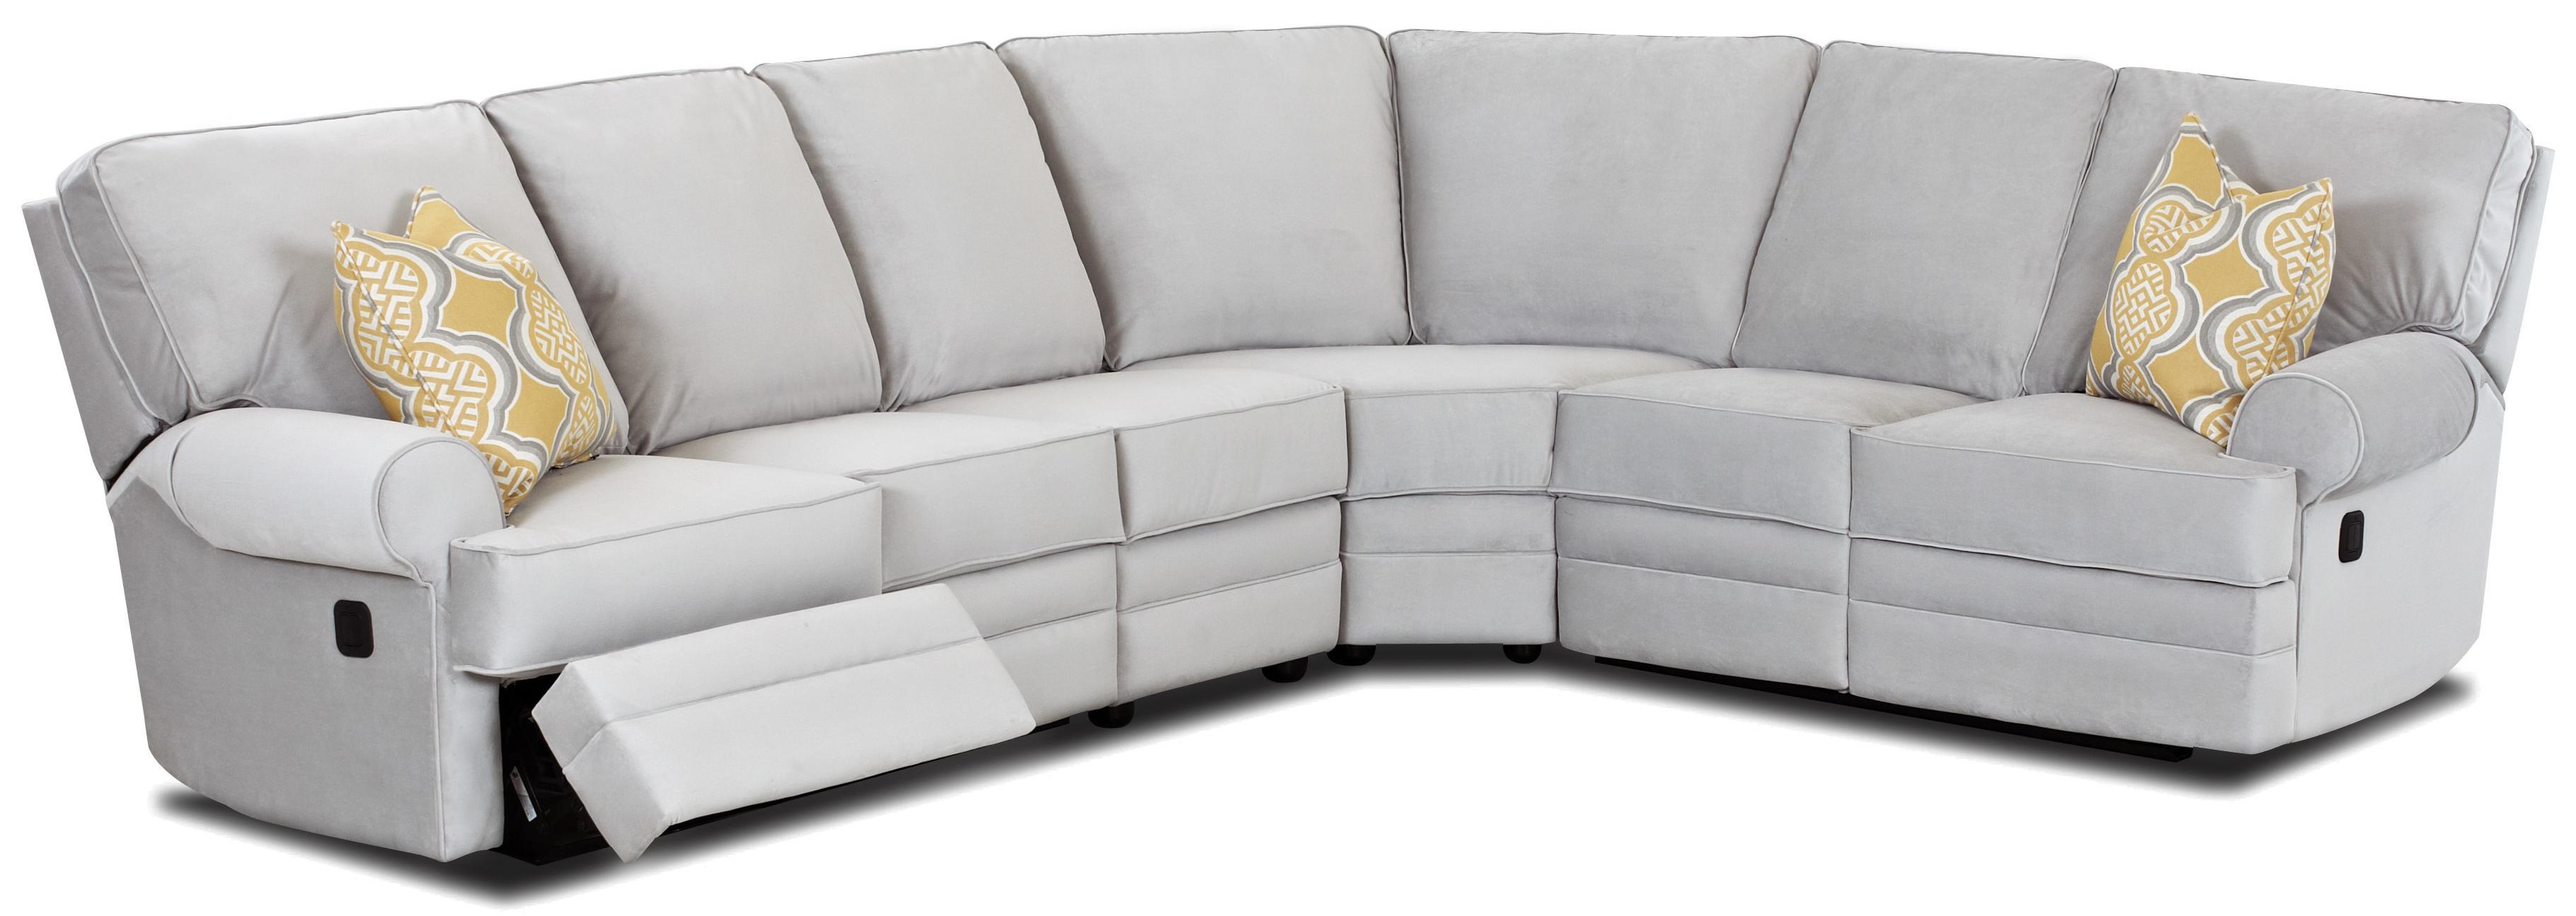 Reclining Sofa Sectional